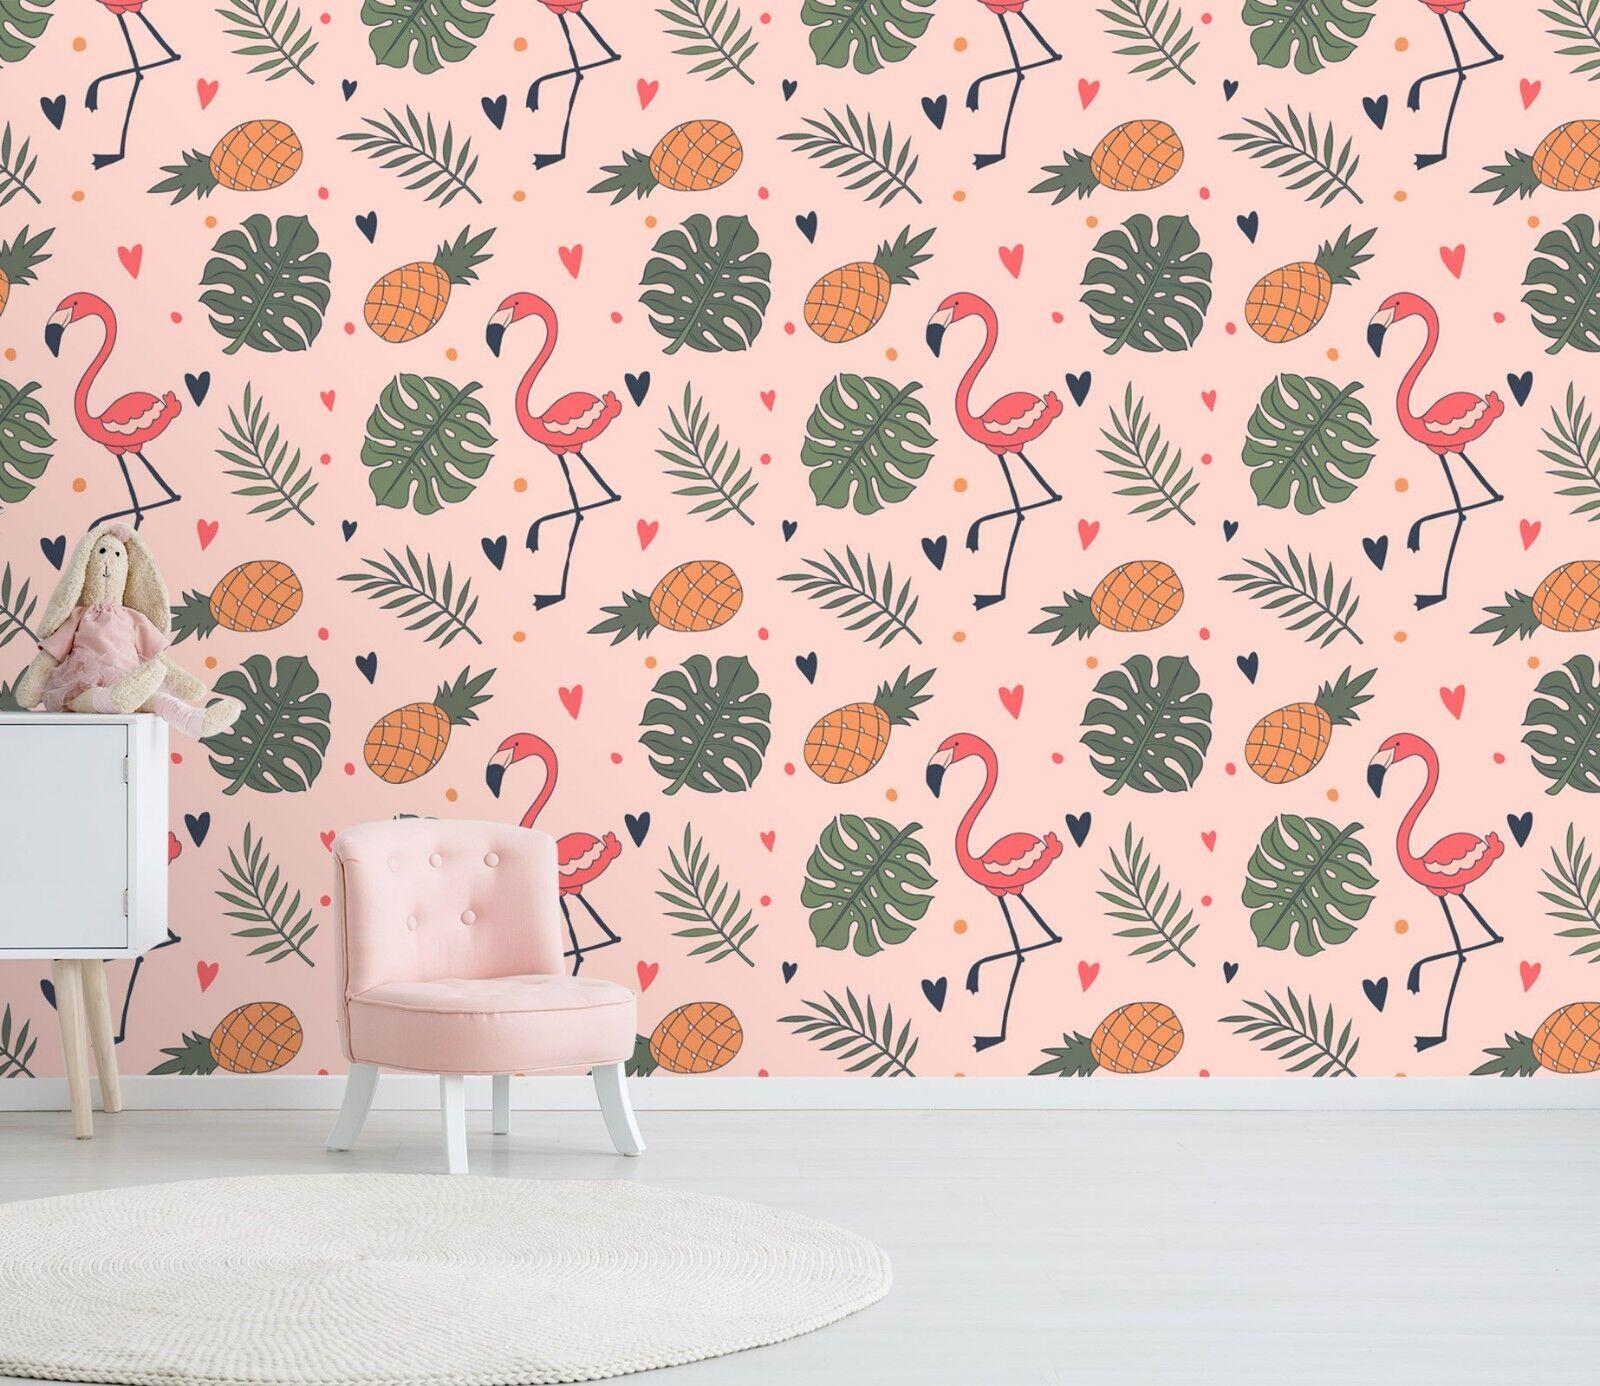 3D Cartoon Flamingo 13 Wallpaper Mural Print Wall Indoor Wallpaper Murals UK